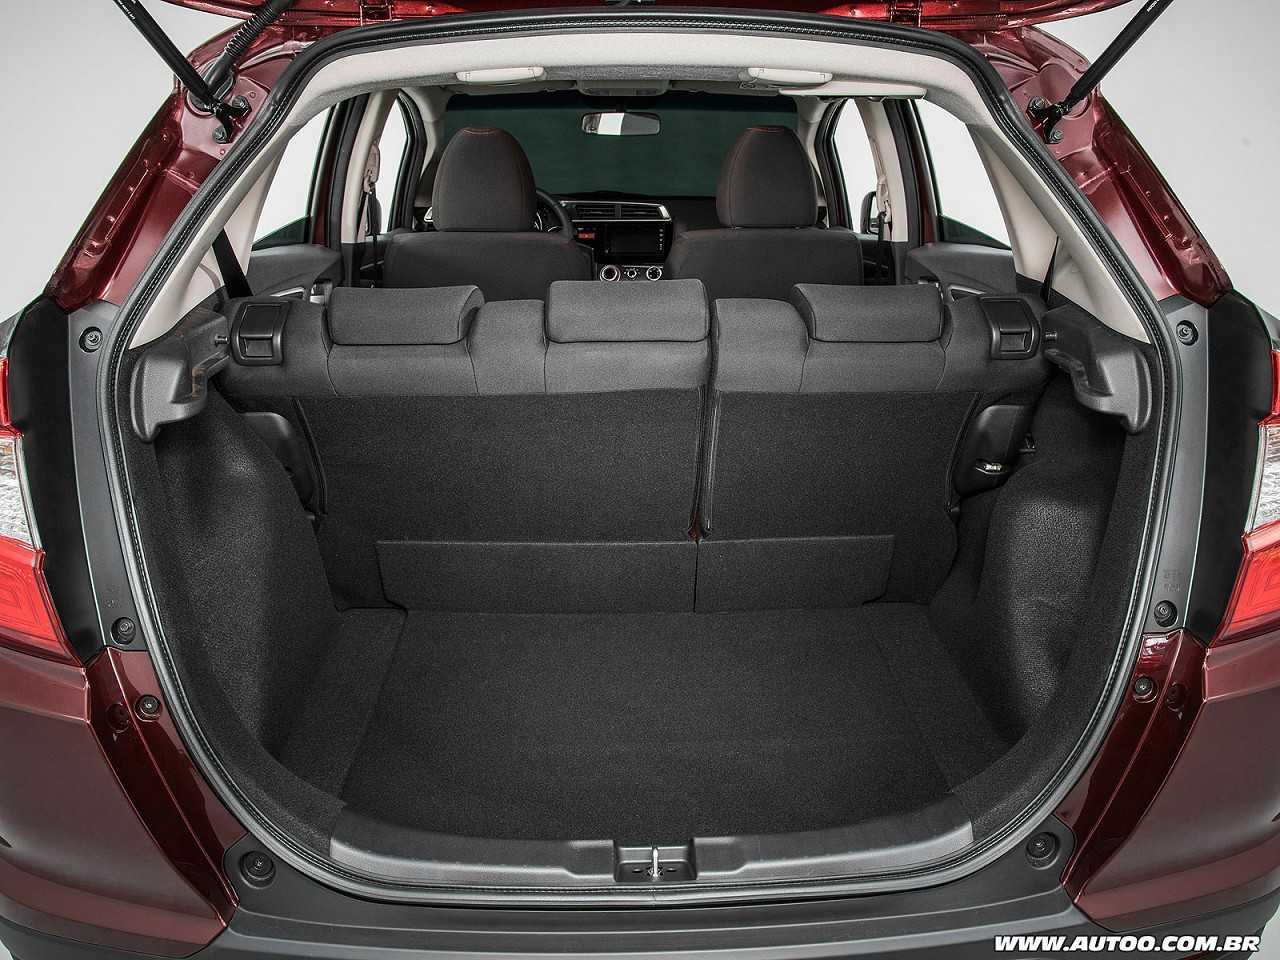 HondaWR-V 2017 - porta-malas